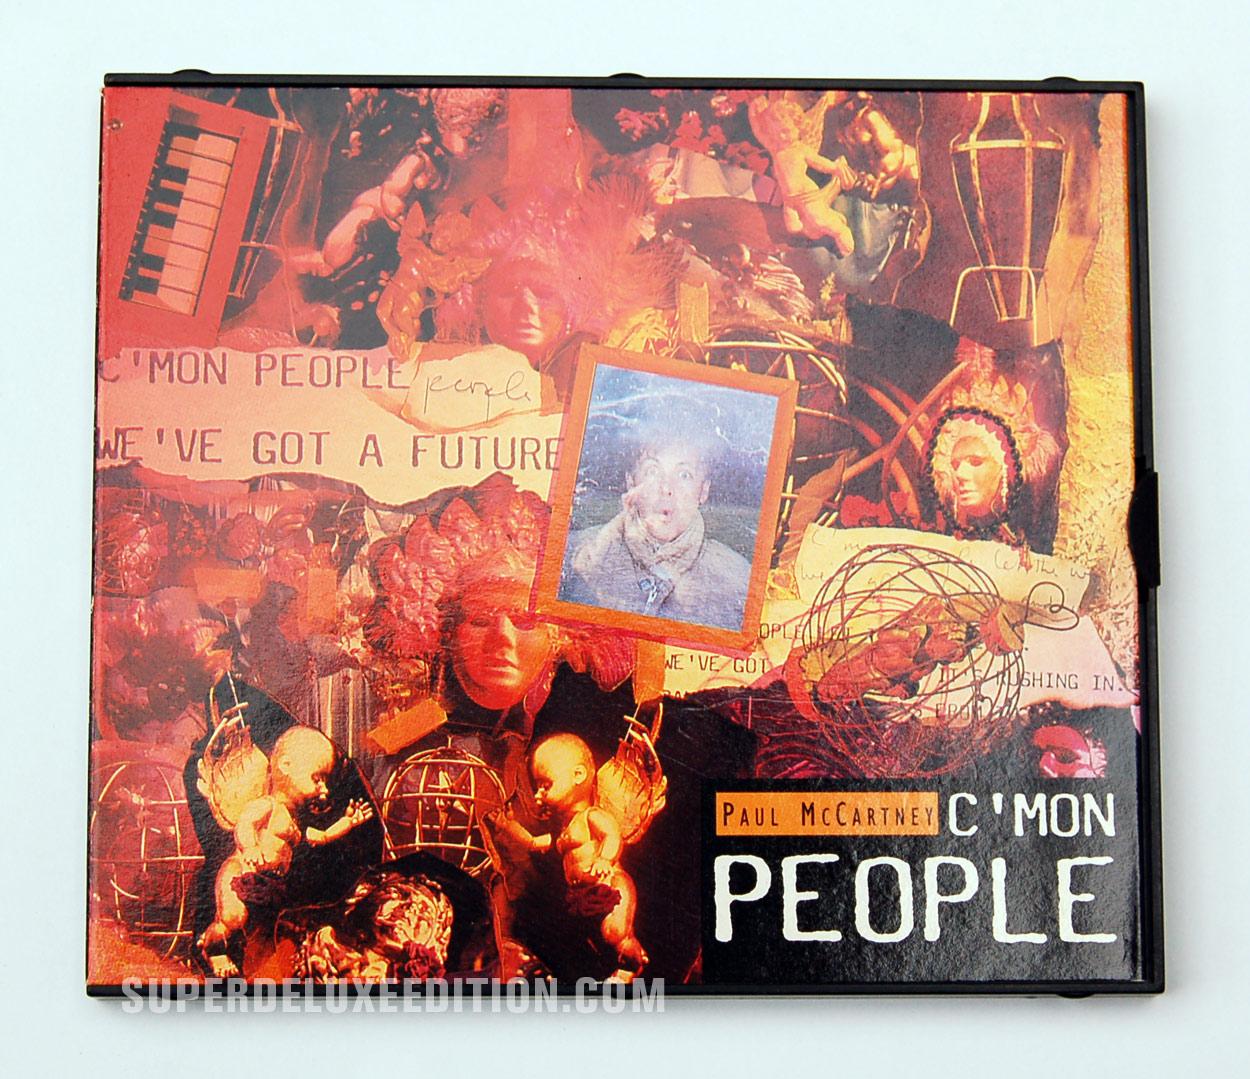 Paul McCartney / C'mon People CD Single